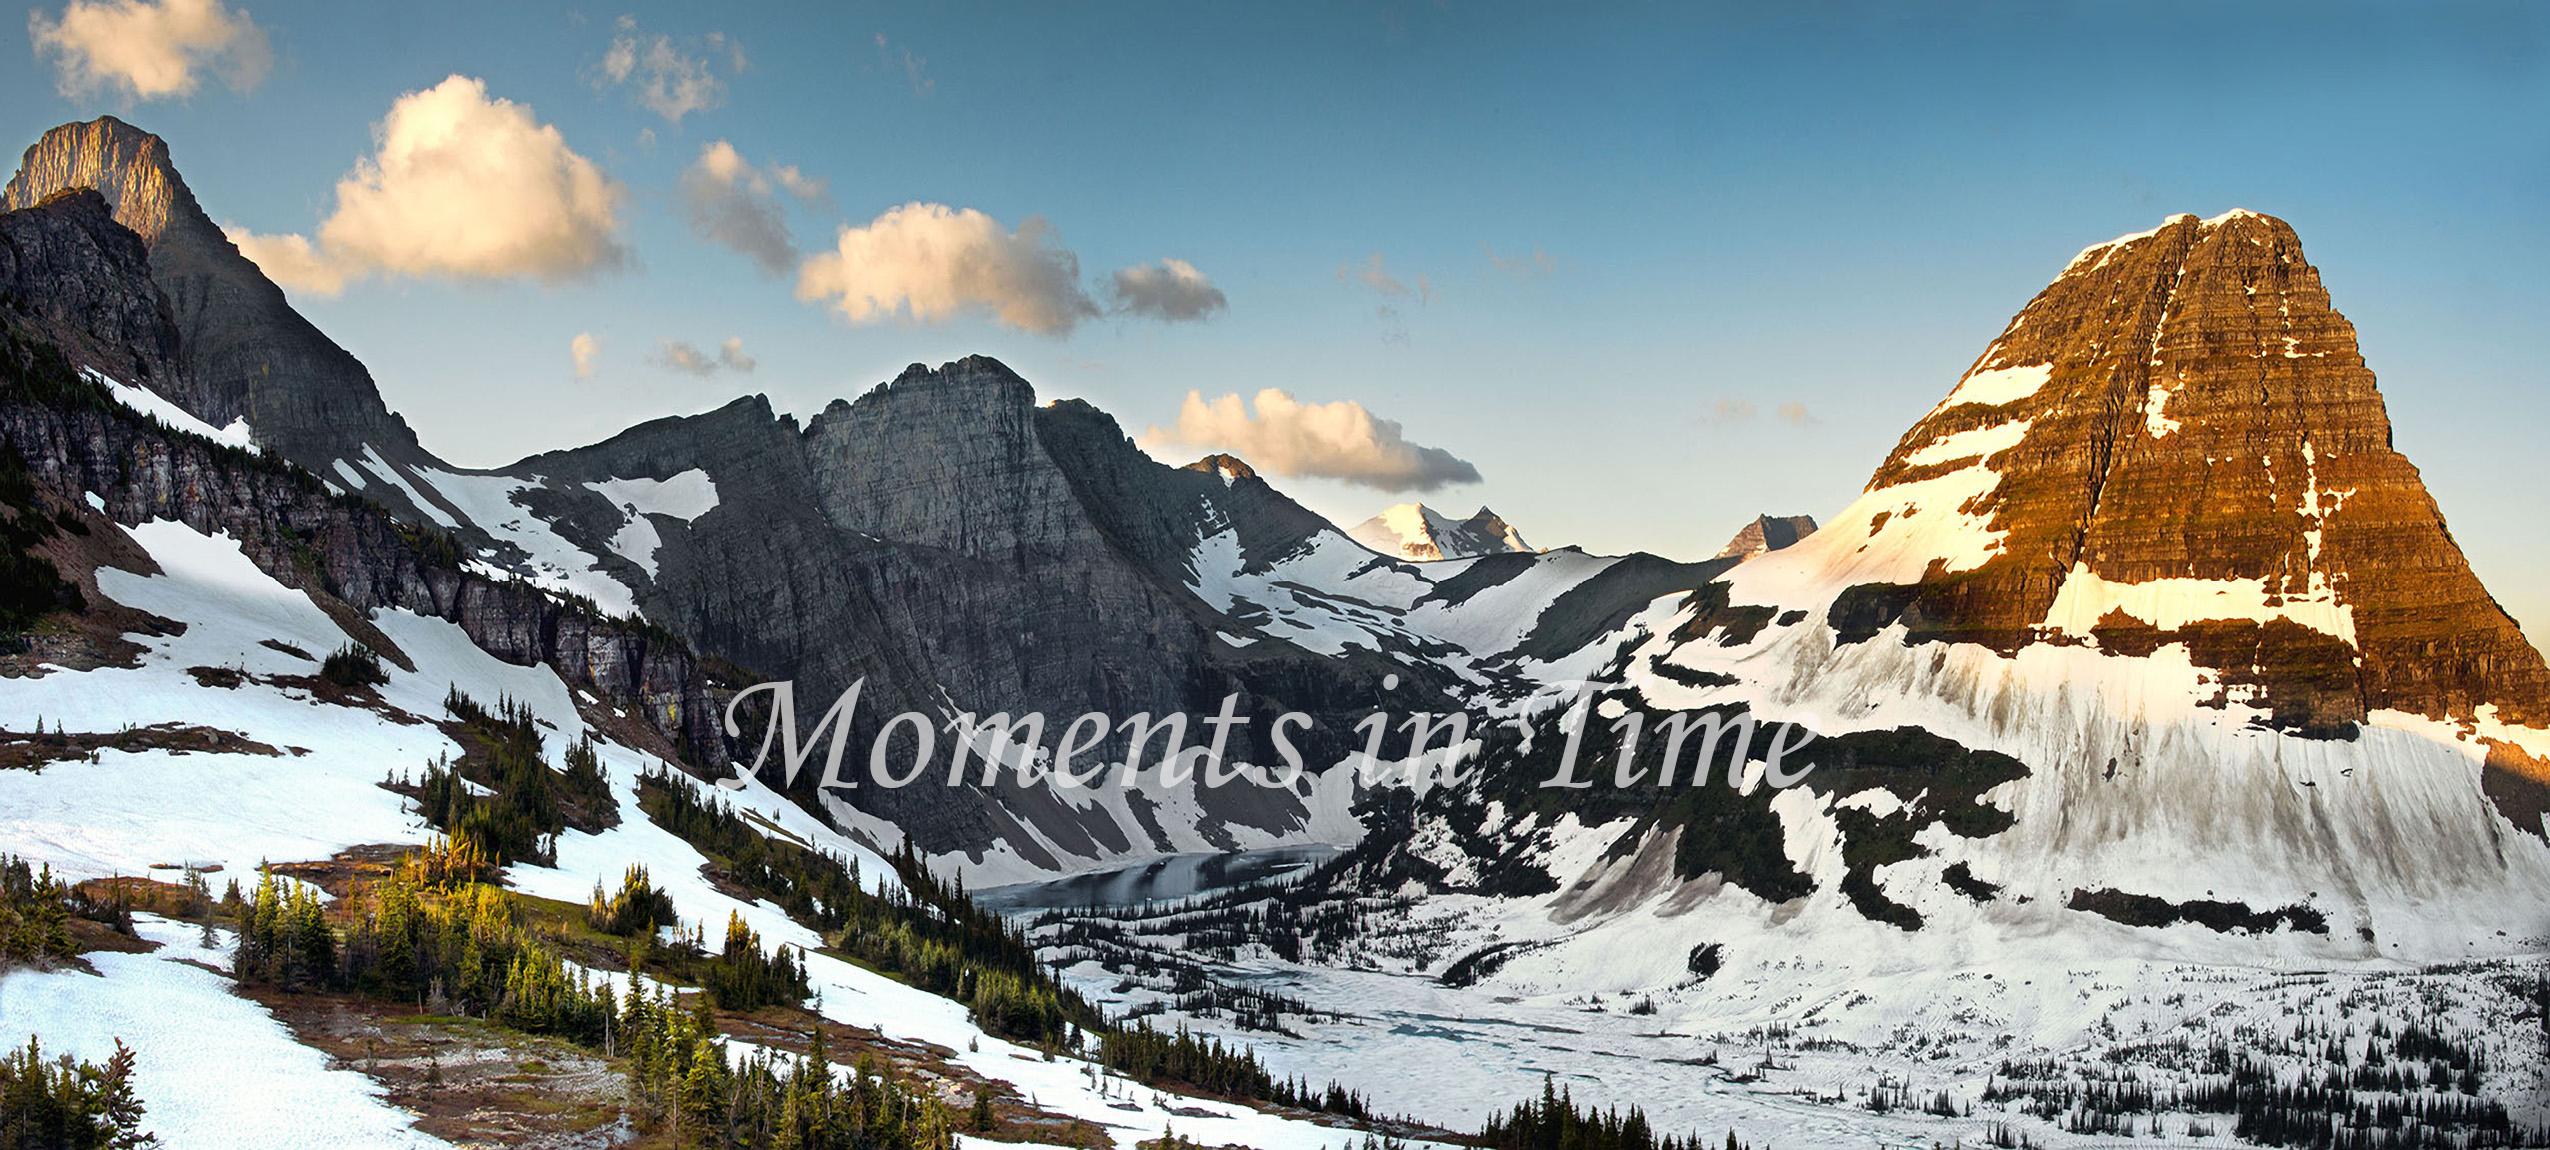 Glacier_Morning